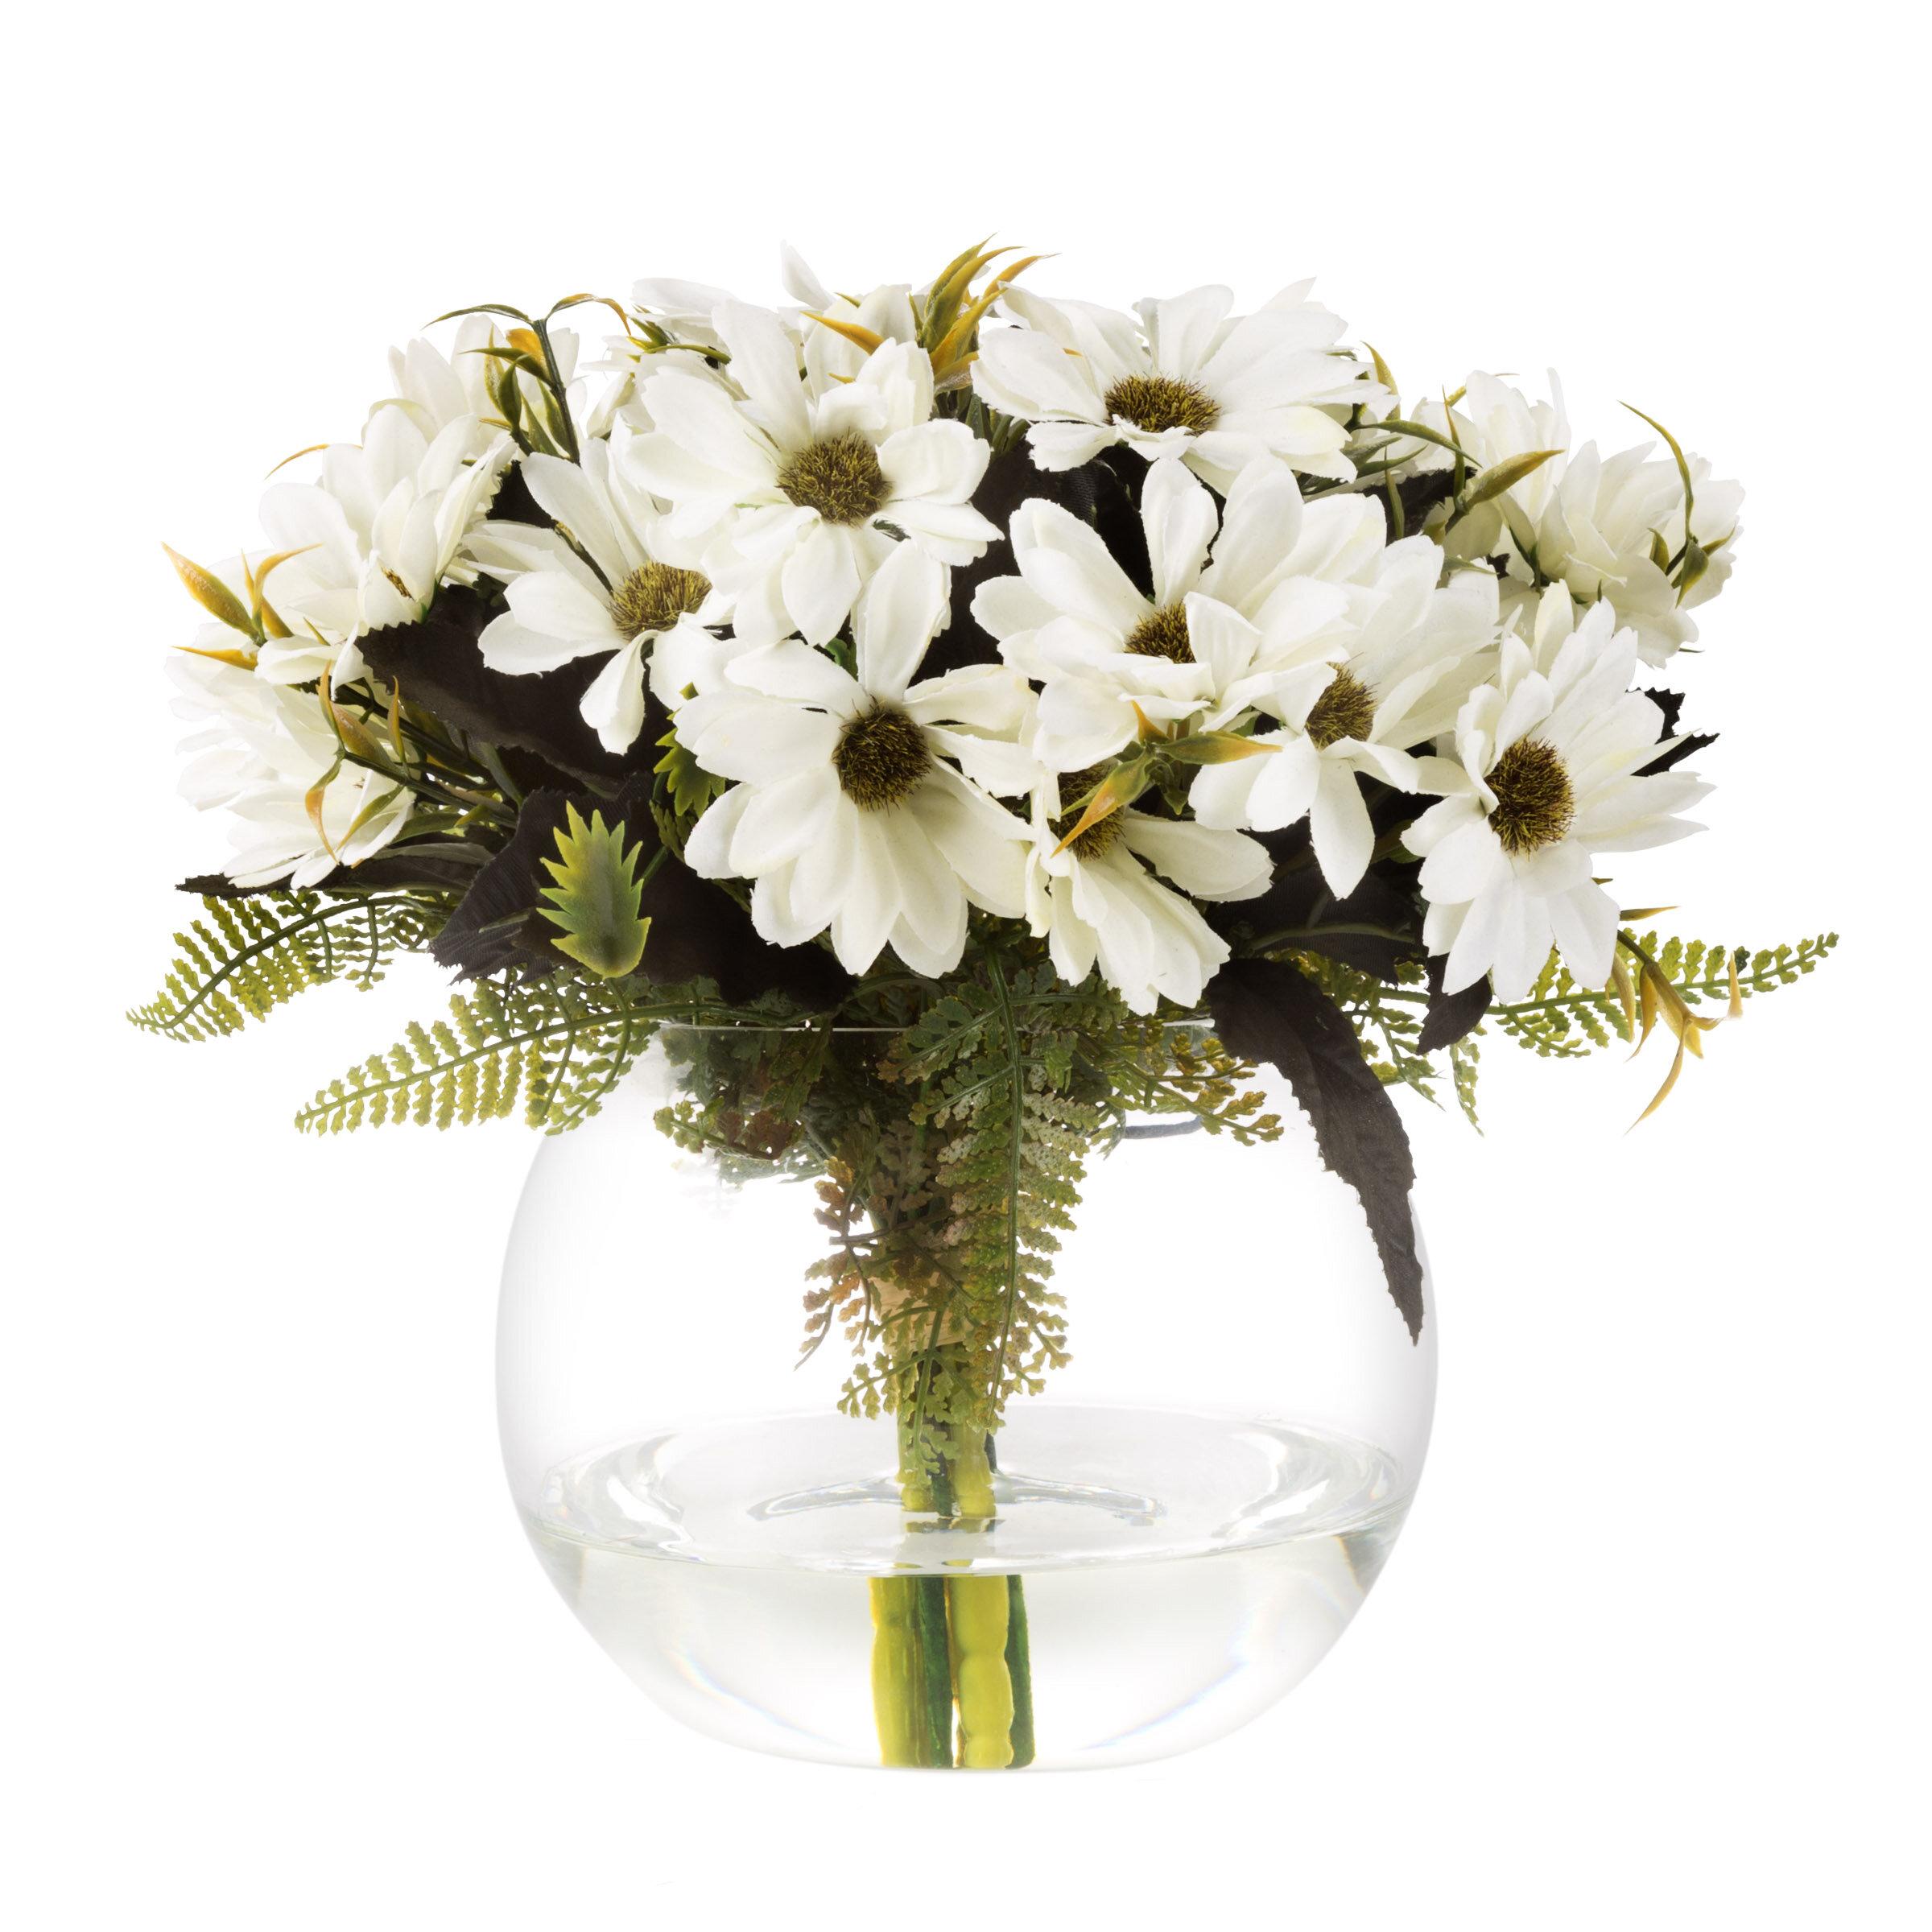 Daisy Floral Arrangement In Glass Vase Reviews Joss Main